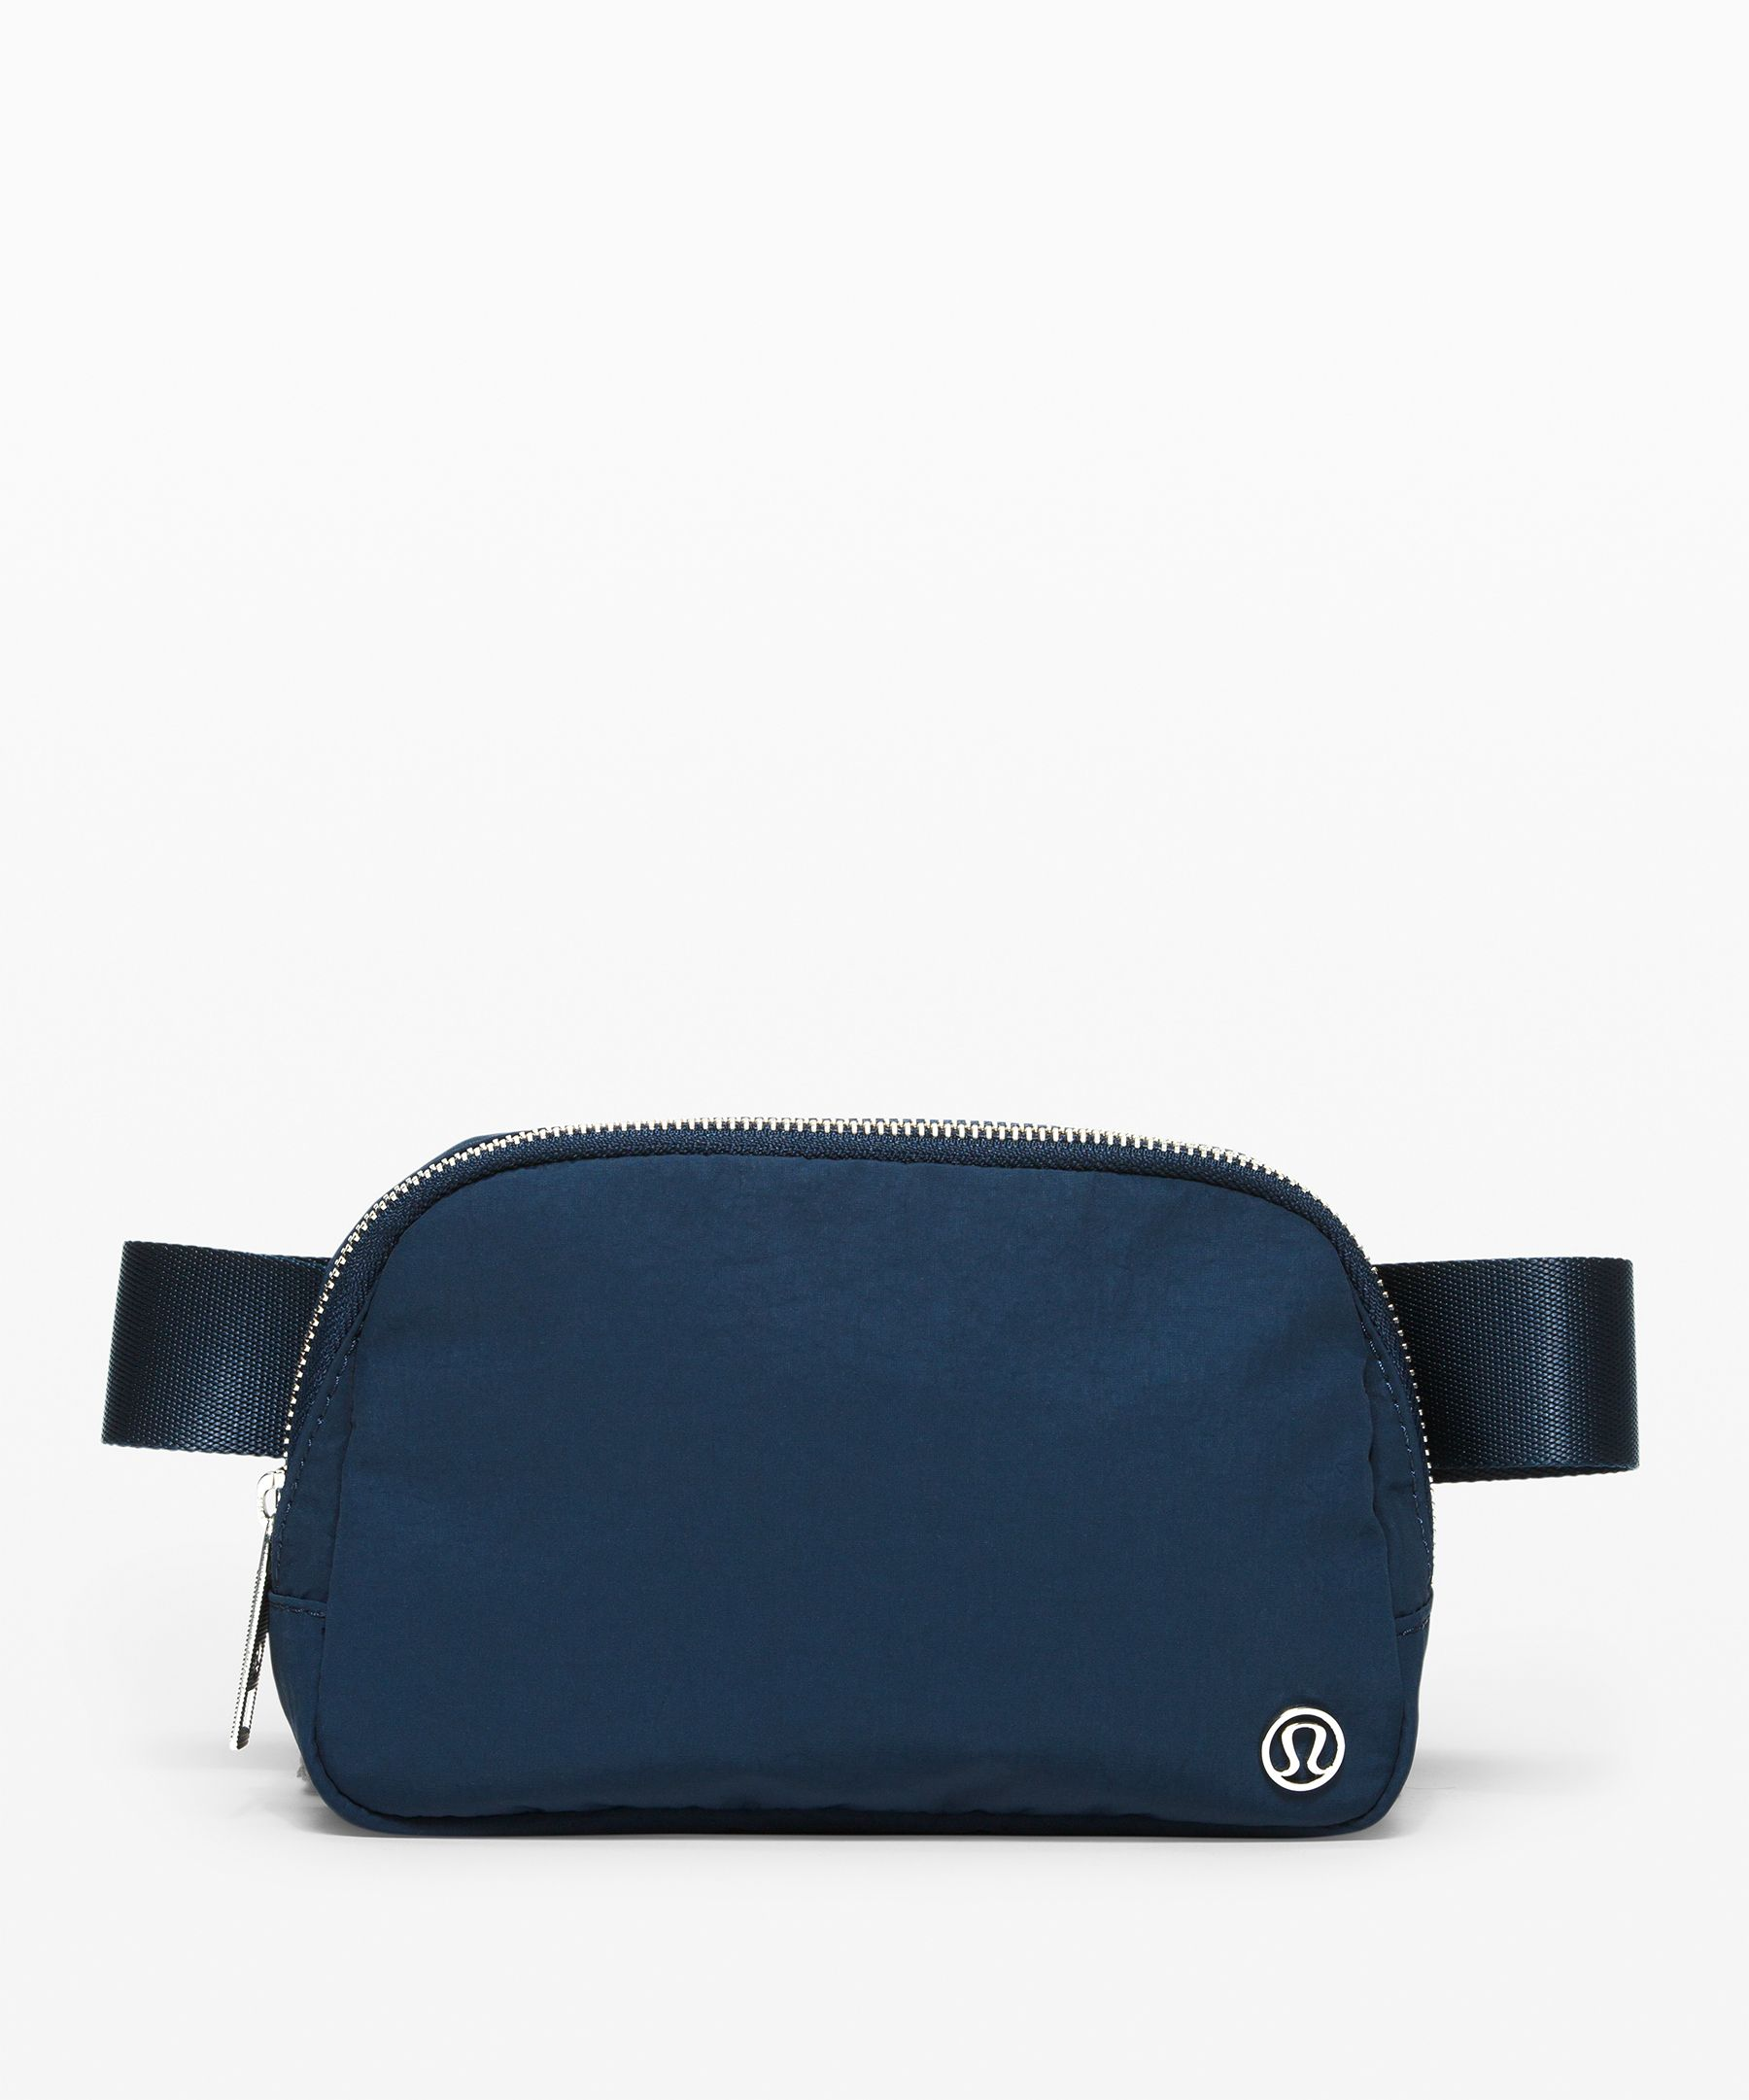 Lululemon Everywhere Belt Bag *1l In Navy